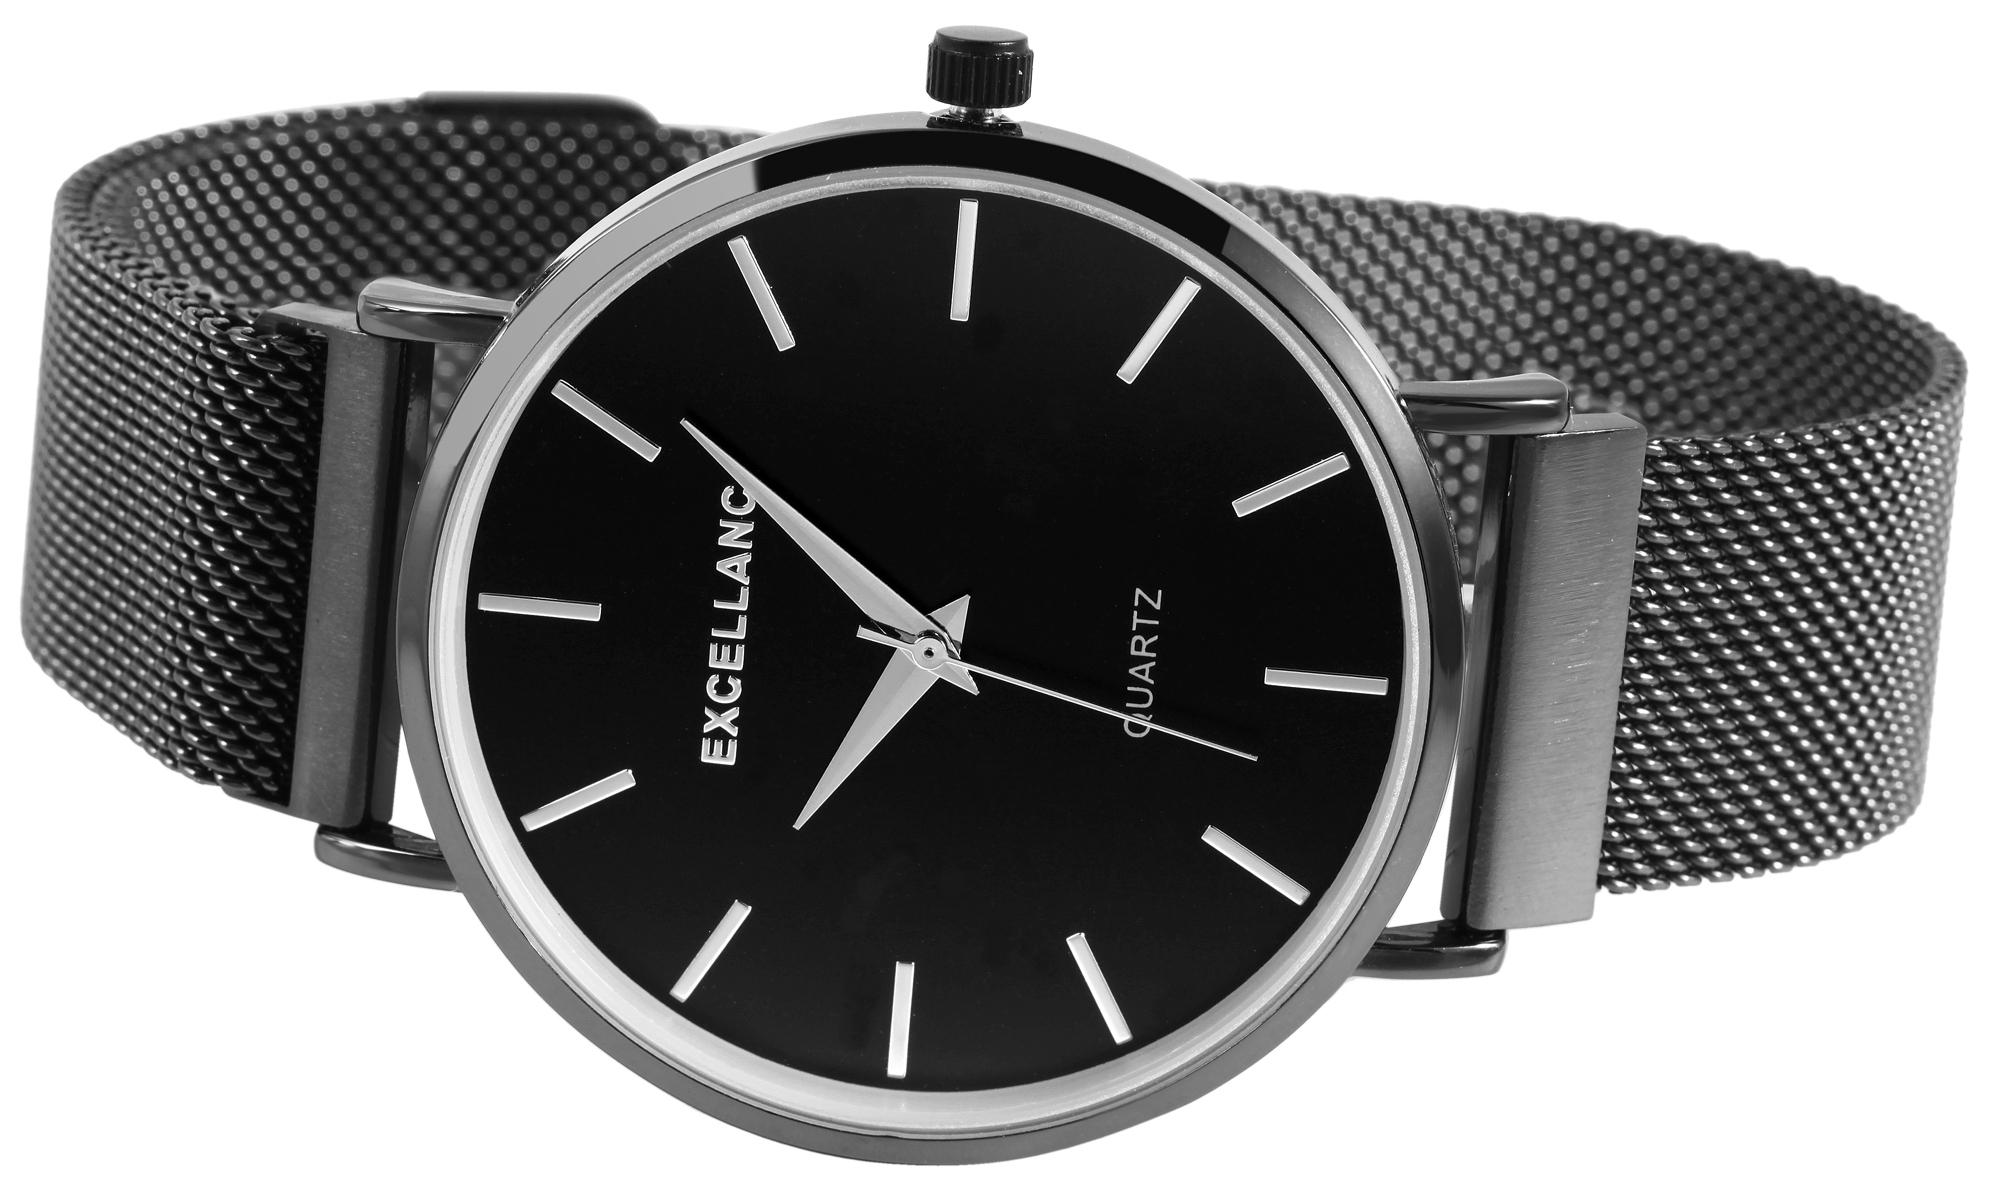 Herren Armbanduhr Mesharmband analog Uhr schwarz